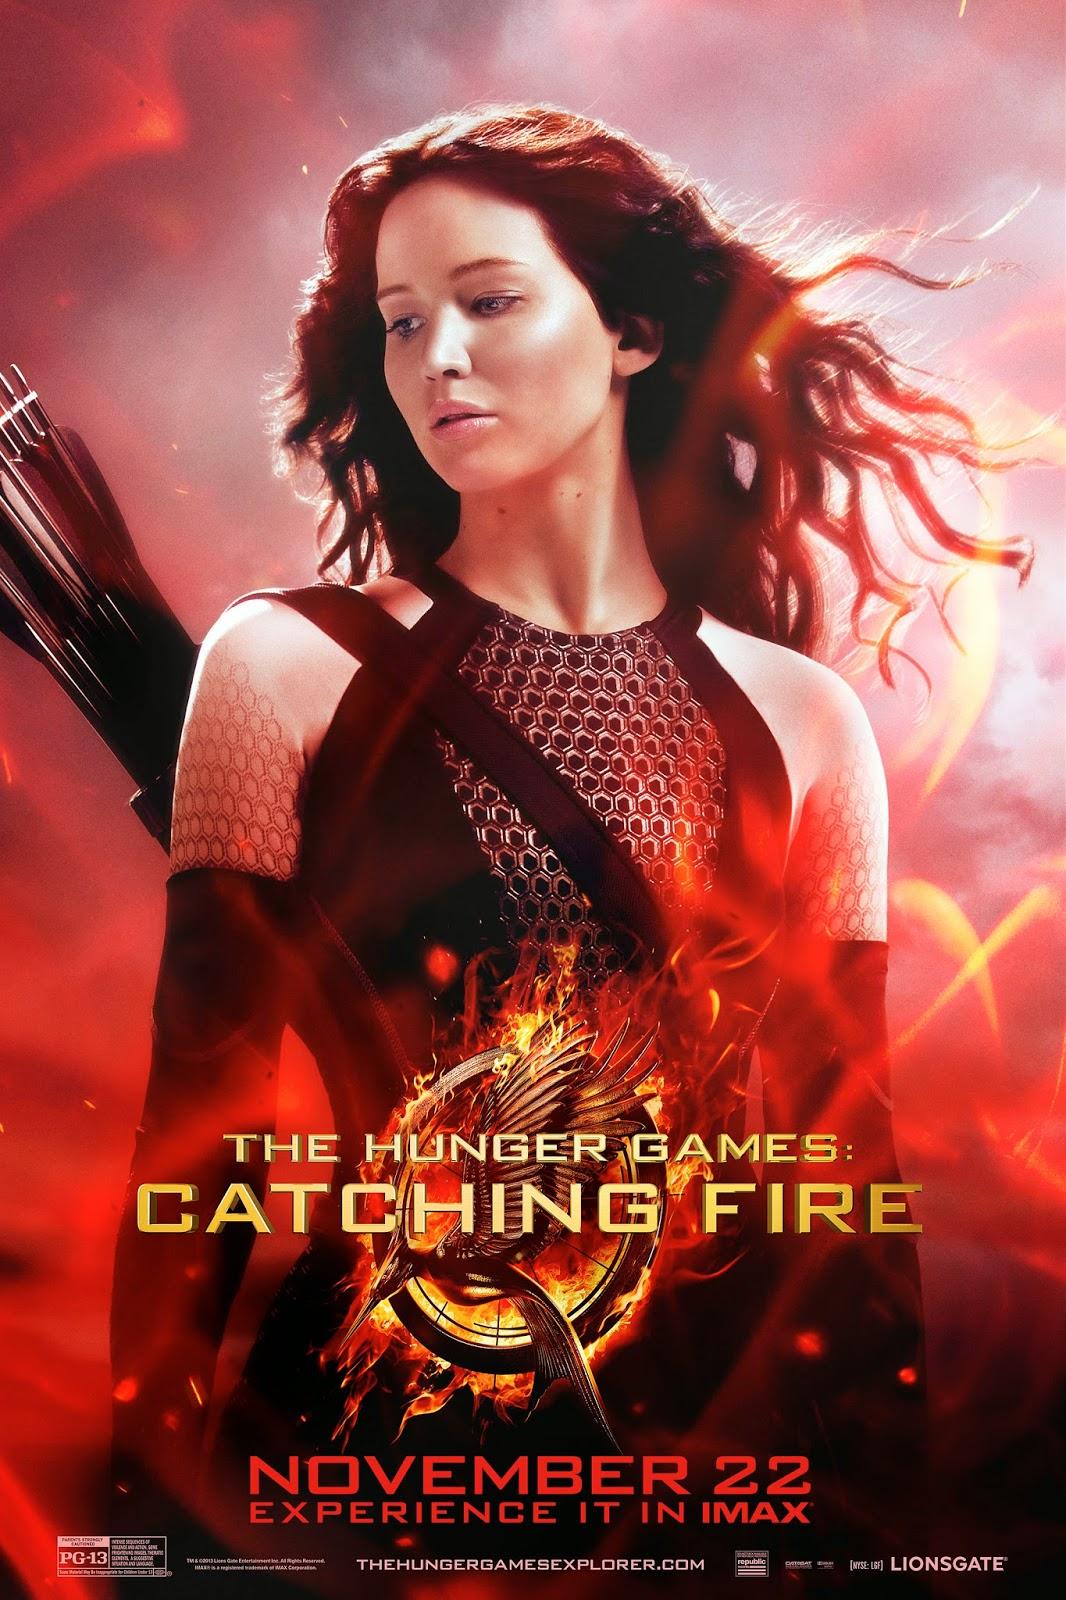 The Hunger Games 2 Catching Fire เกมล่าเกม 2 แคชชิ่งไฟเออร์ [HD][พากย์ไทย]